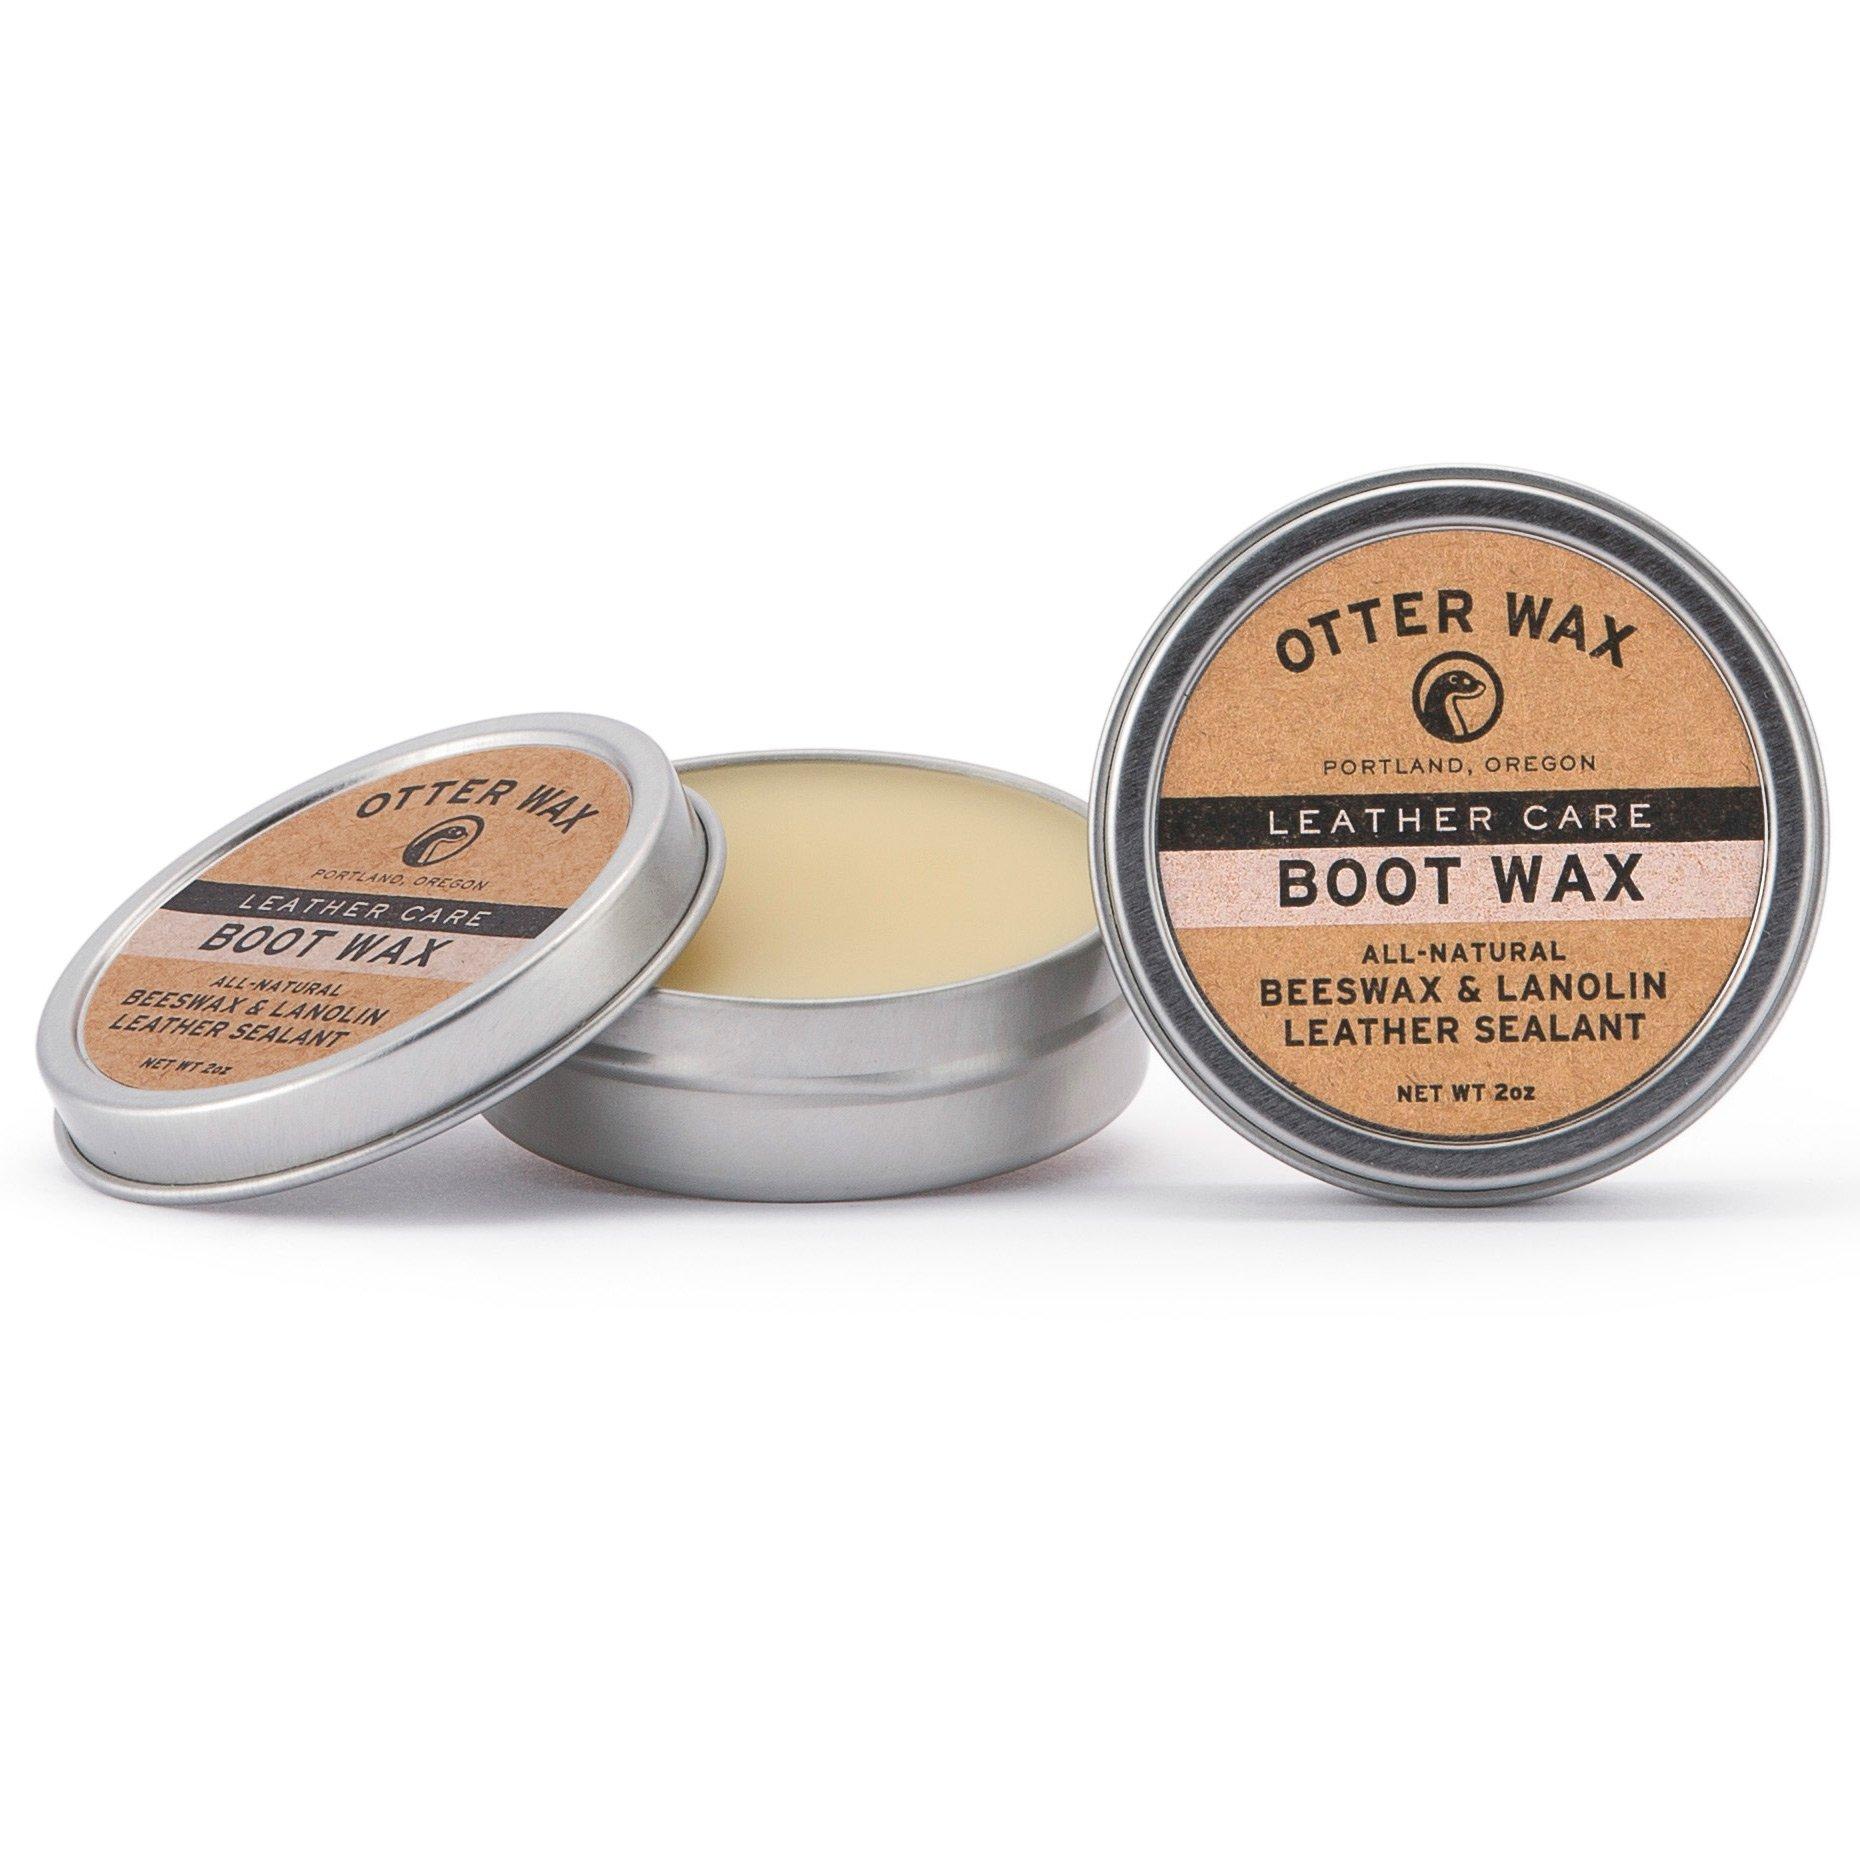 Otter Wax Boot Wax   2 oz   Impermeabilizante de cuero total